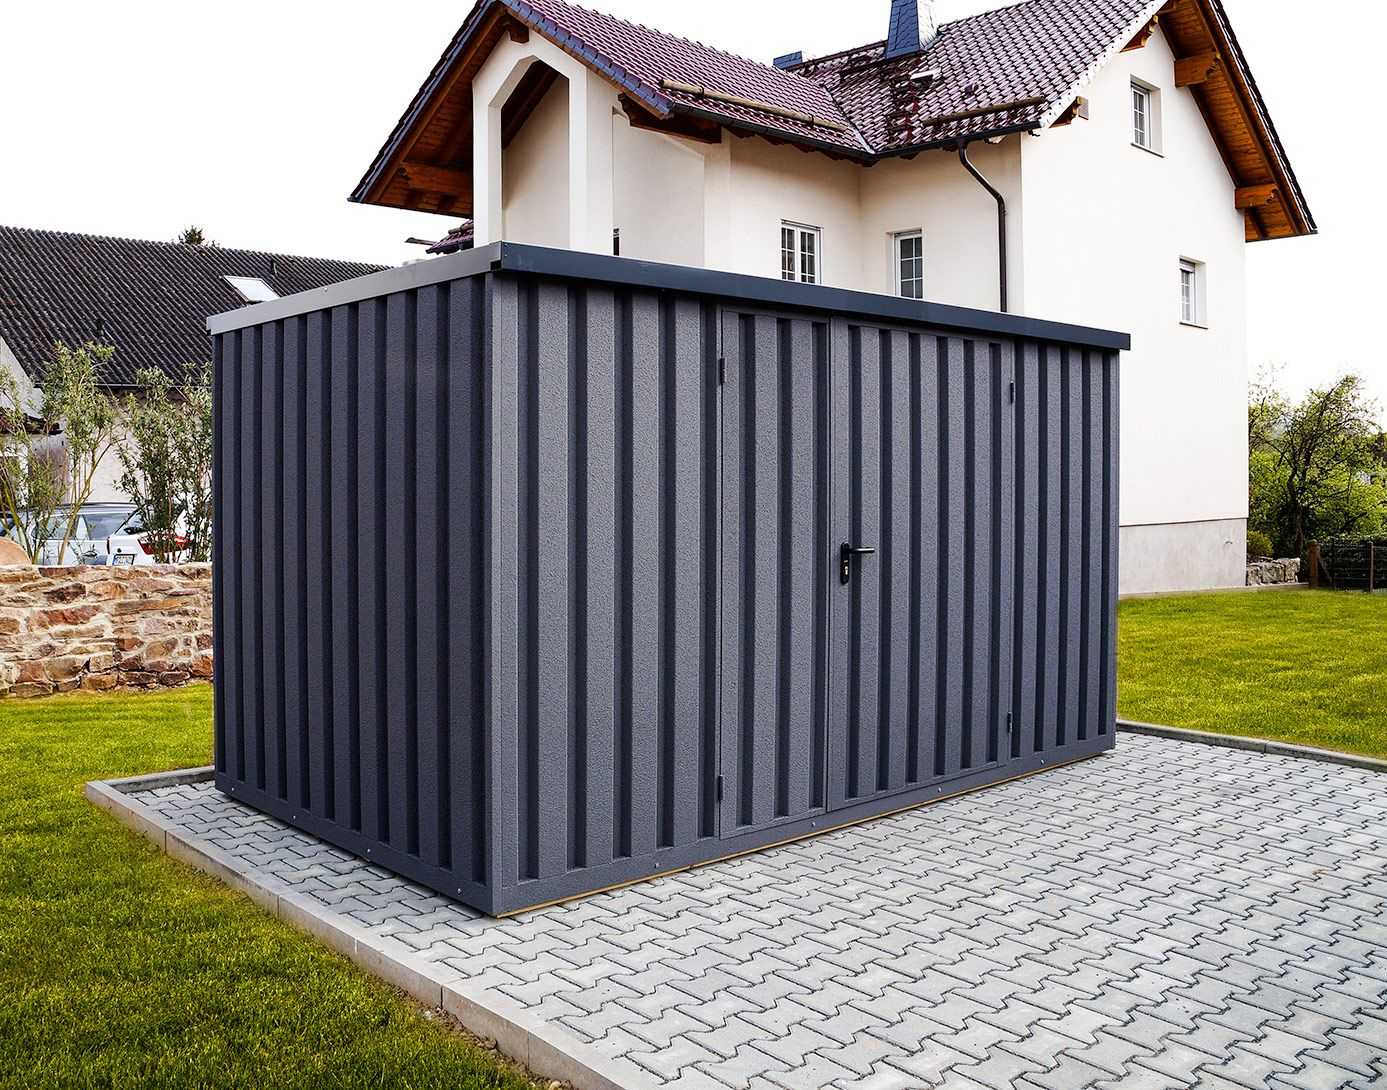 Siebau Carport gardenboxx gerätehaus mit dekorputz siebau carport